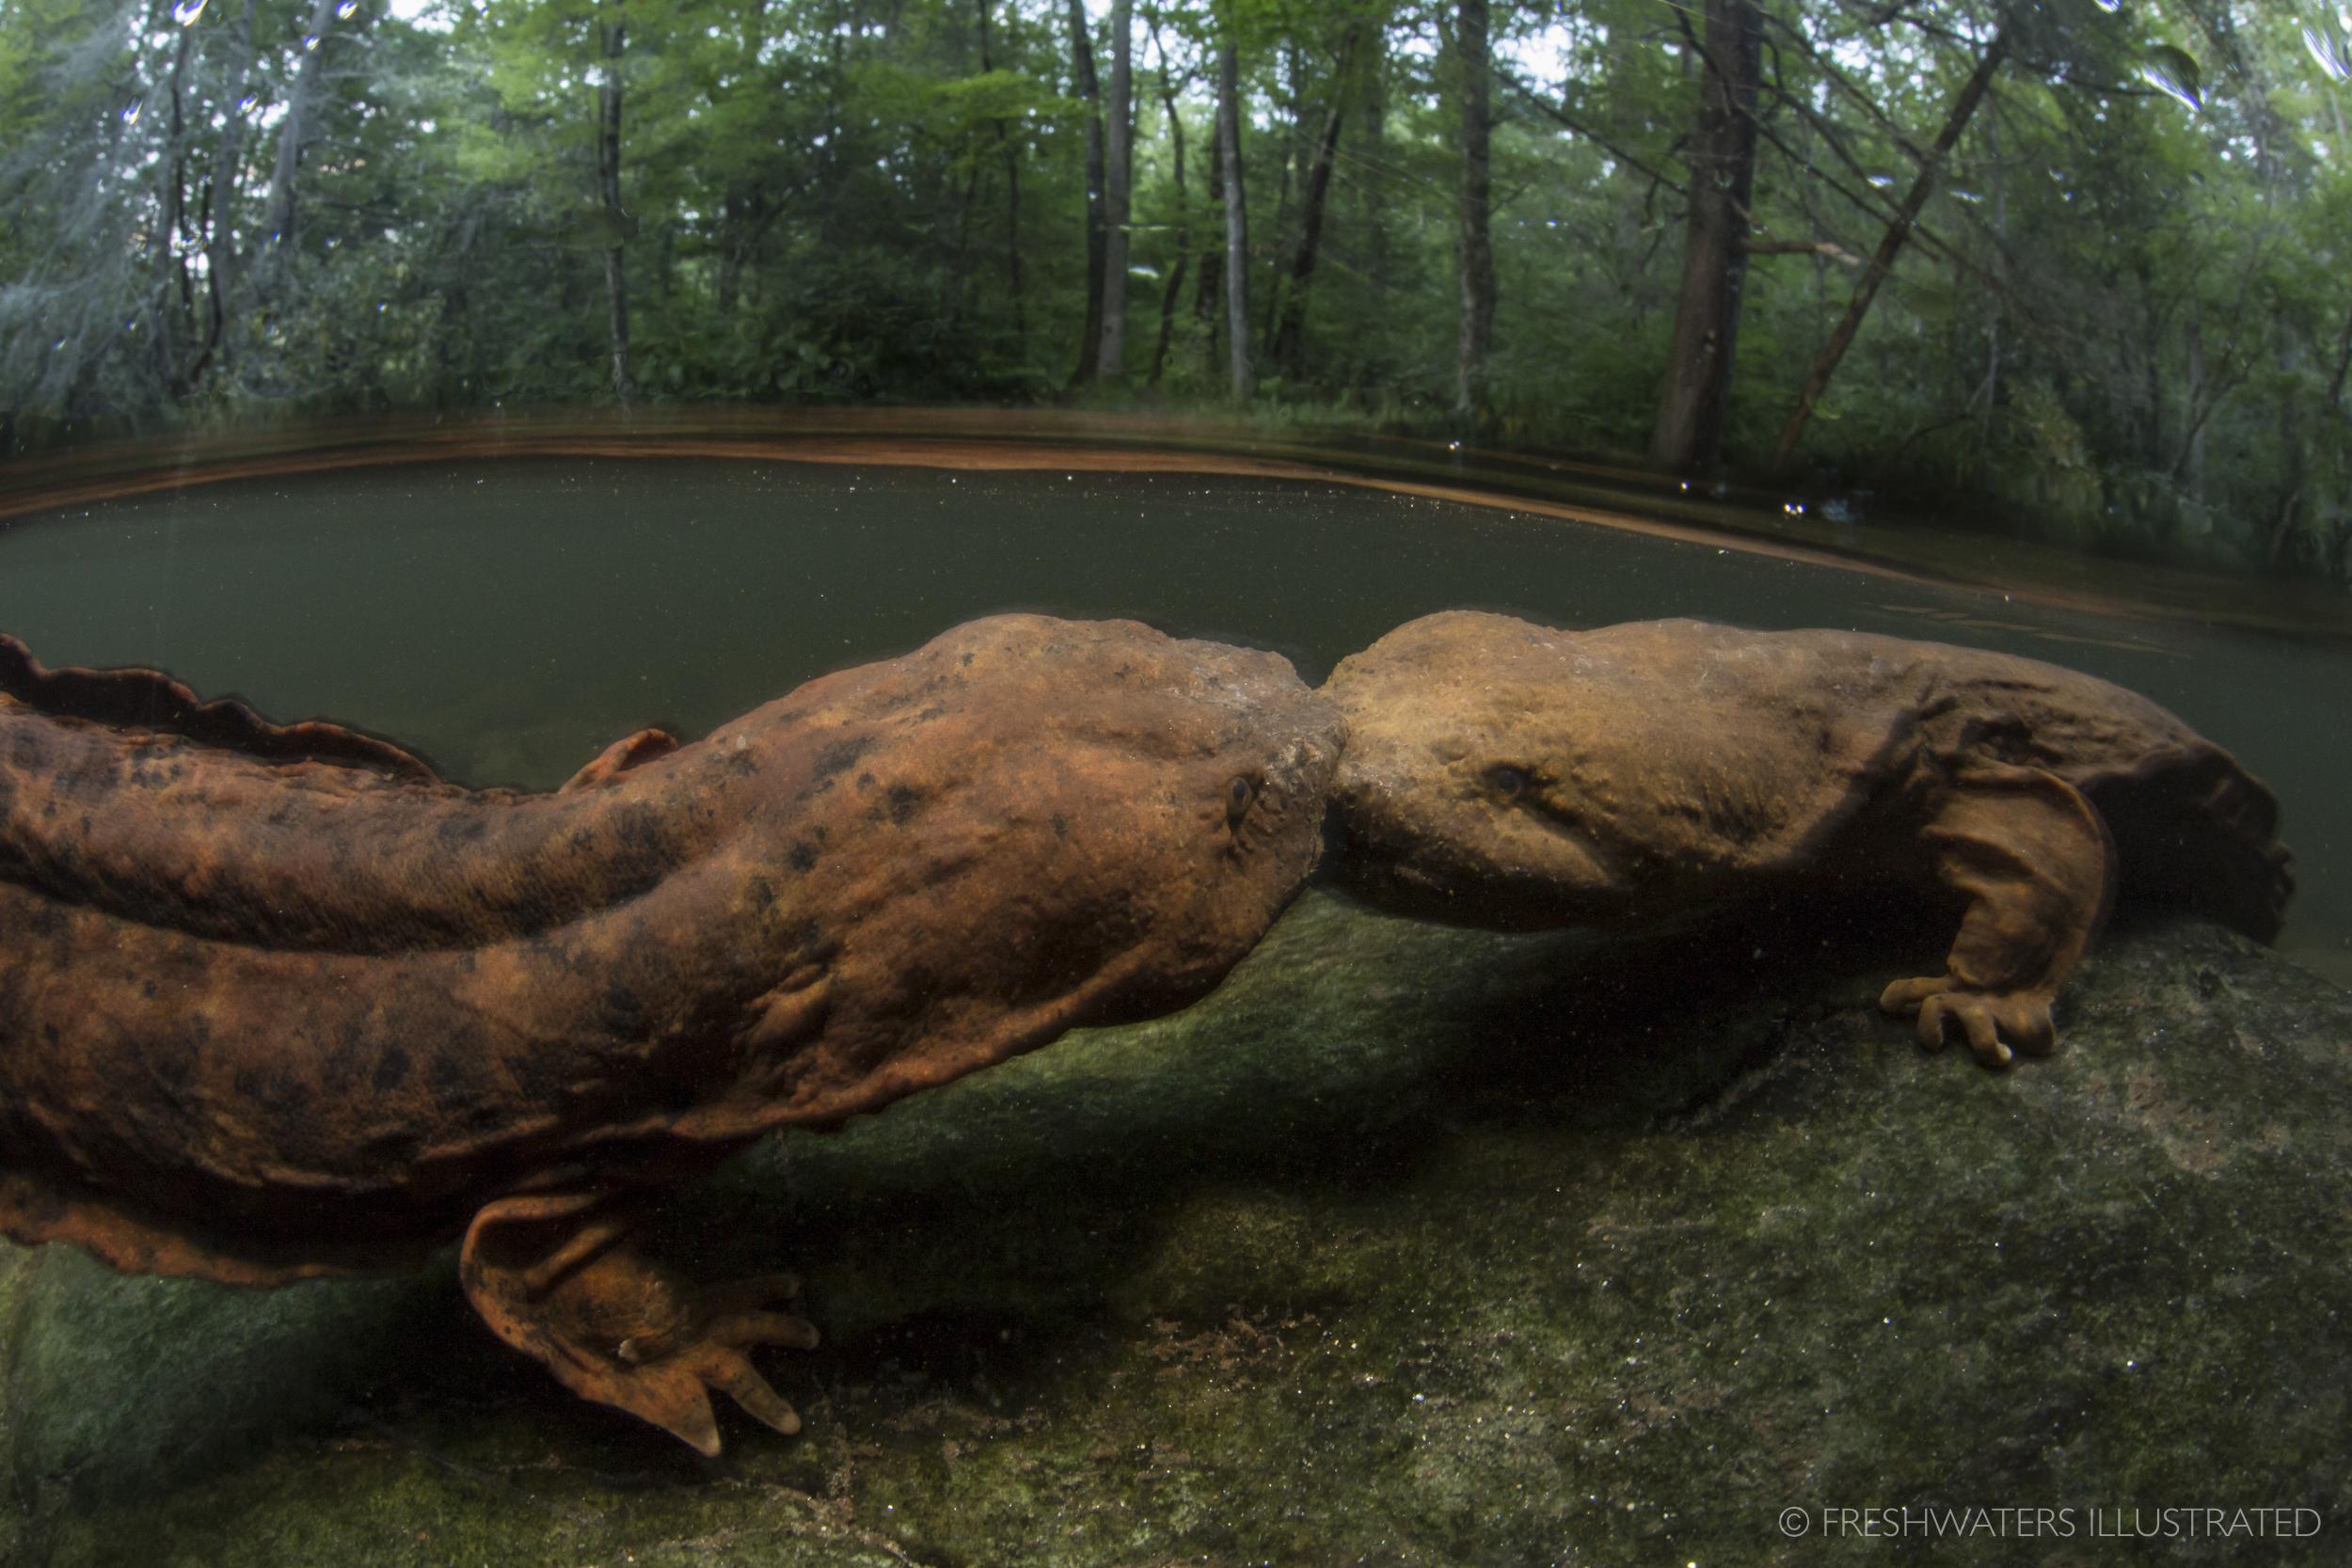 Two male Eastern hellbenders (Cryptobranchus alleganiensis) fight over prime breeding habitat. North Carolina  www.FreshwatersIllustrated.org